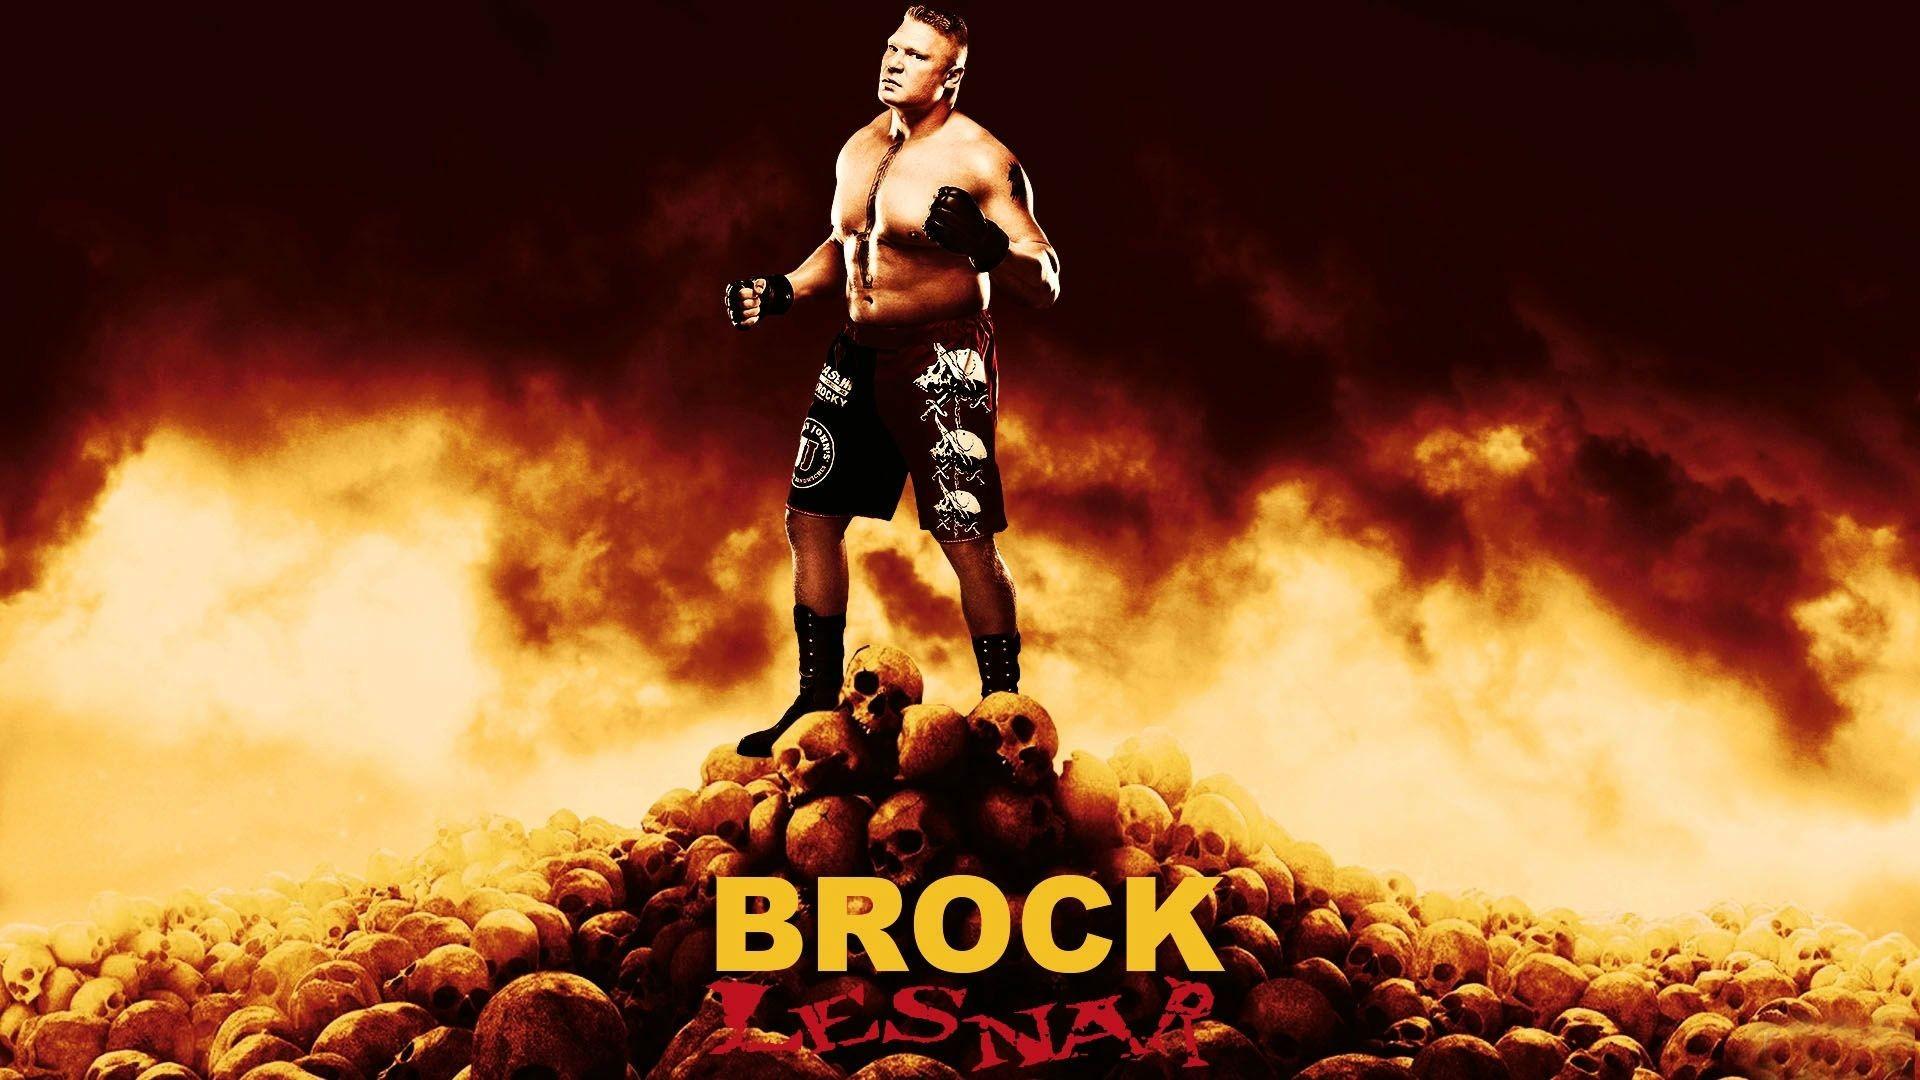 Brock Lesnar Pictures